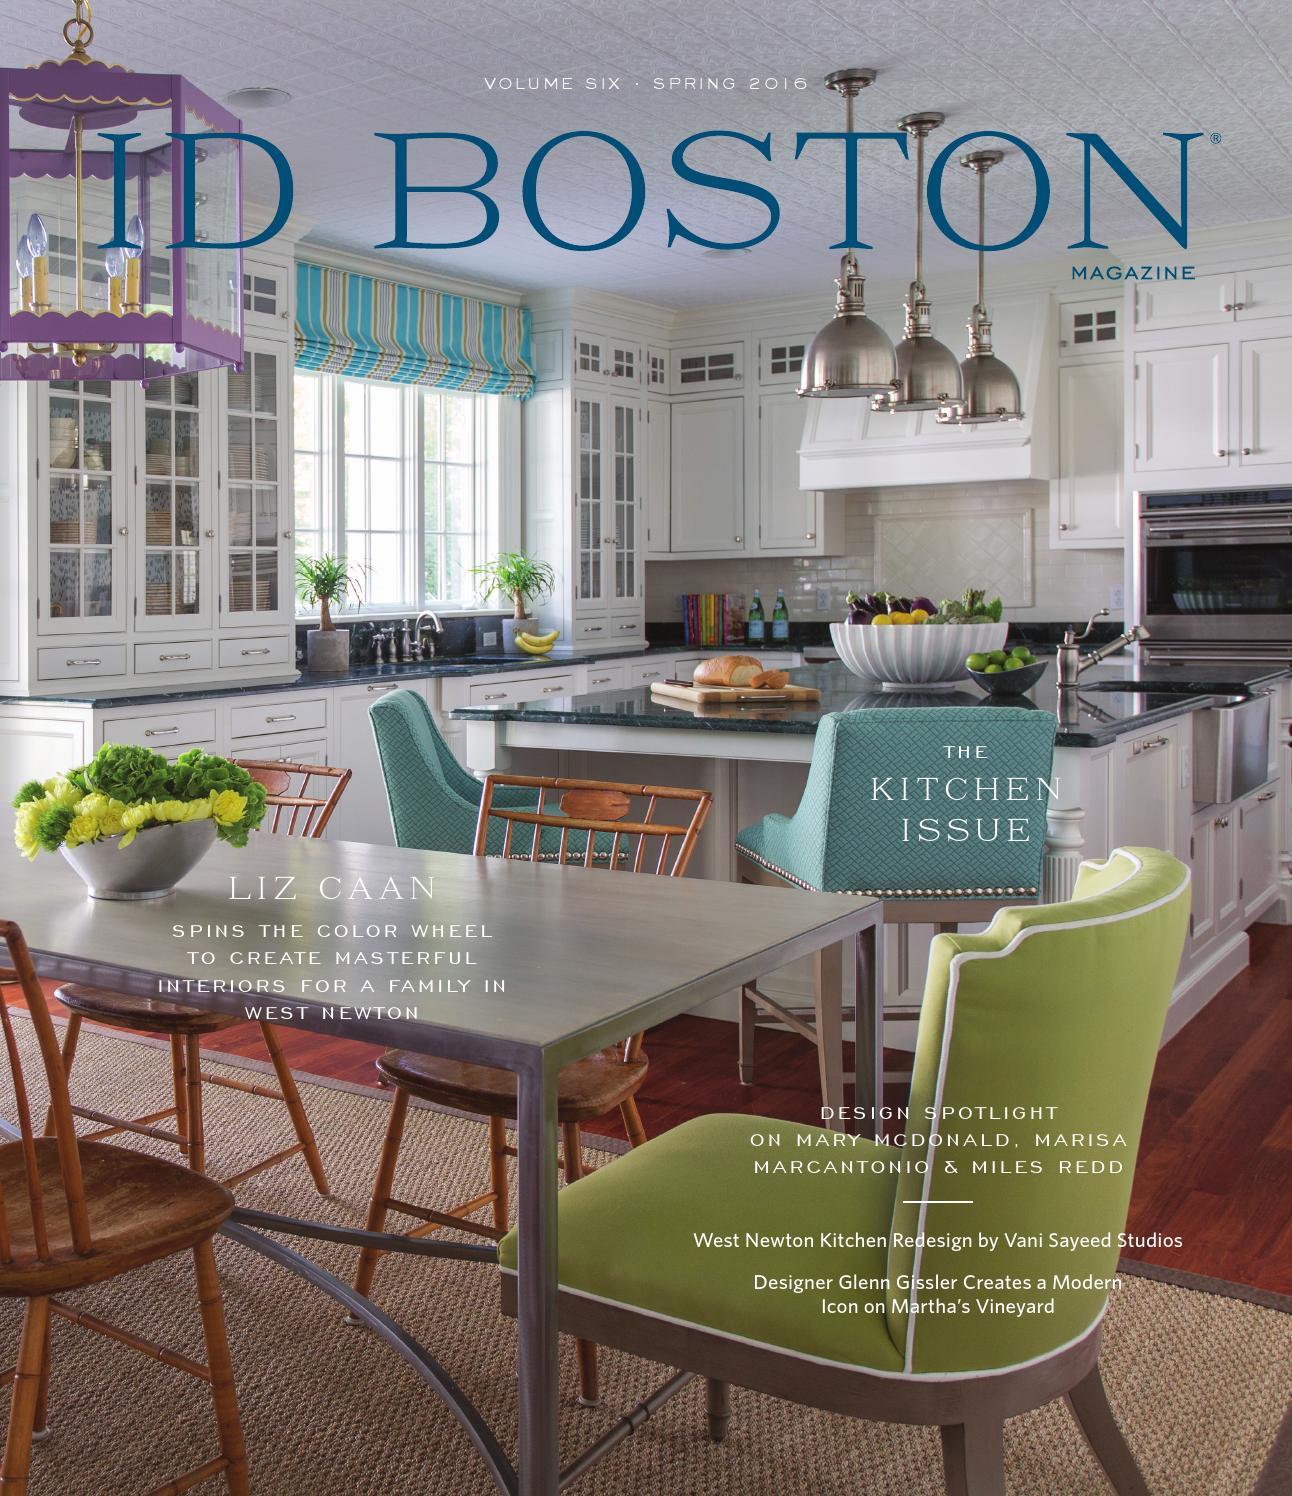 Id Boston Vol 6 By Bostondesigncenter